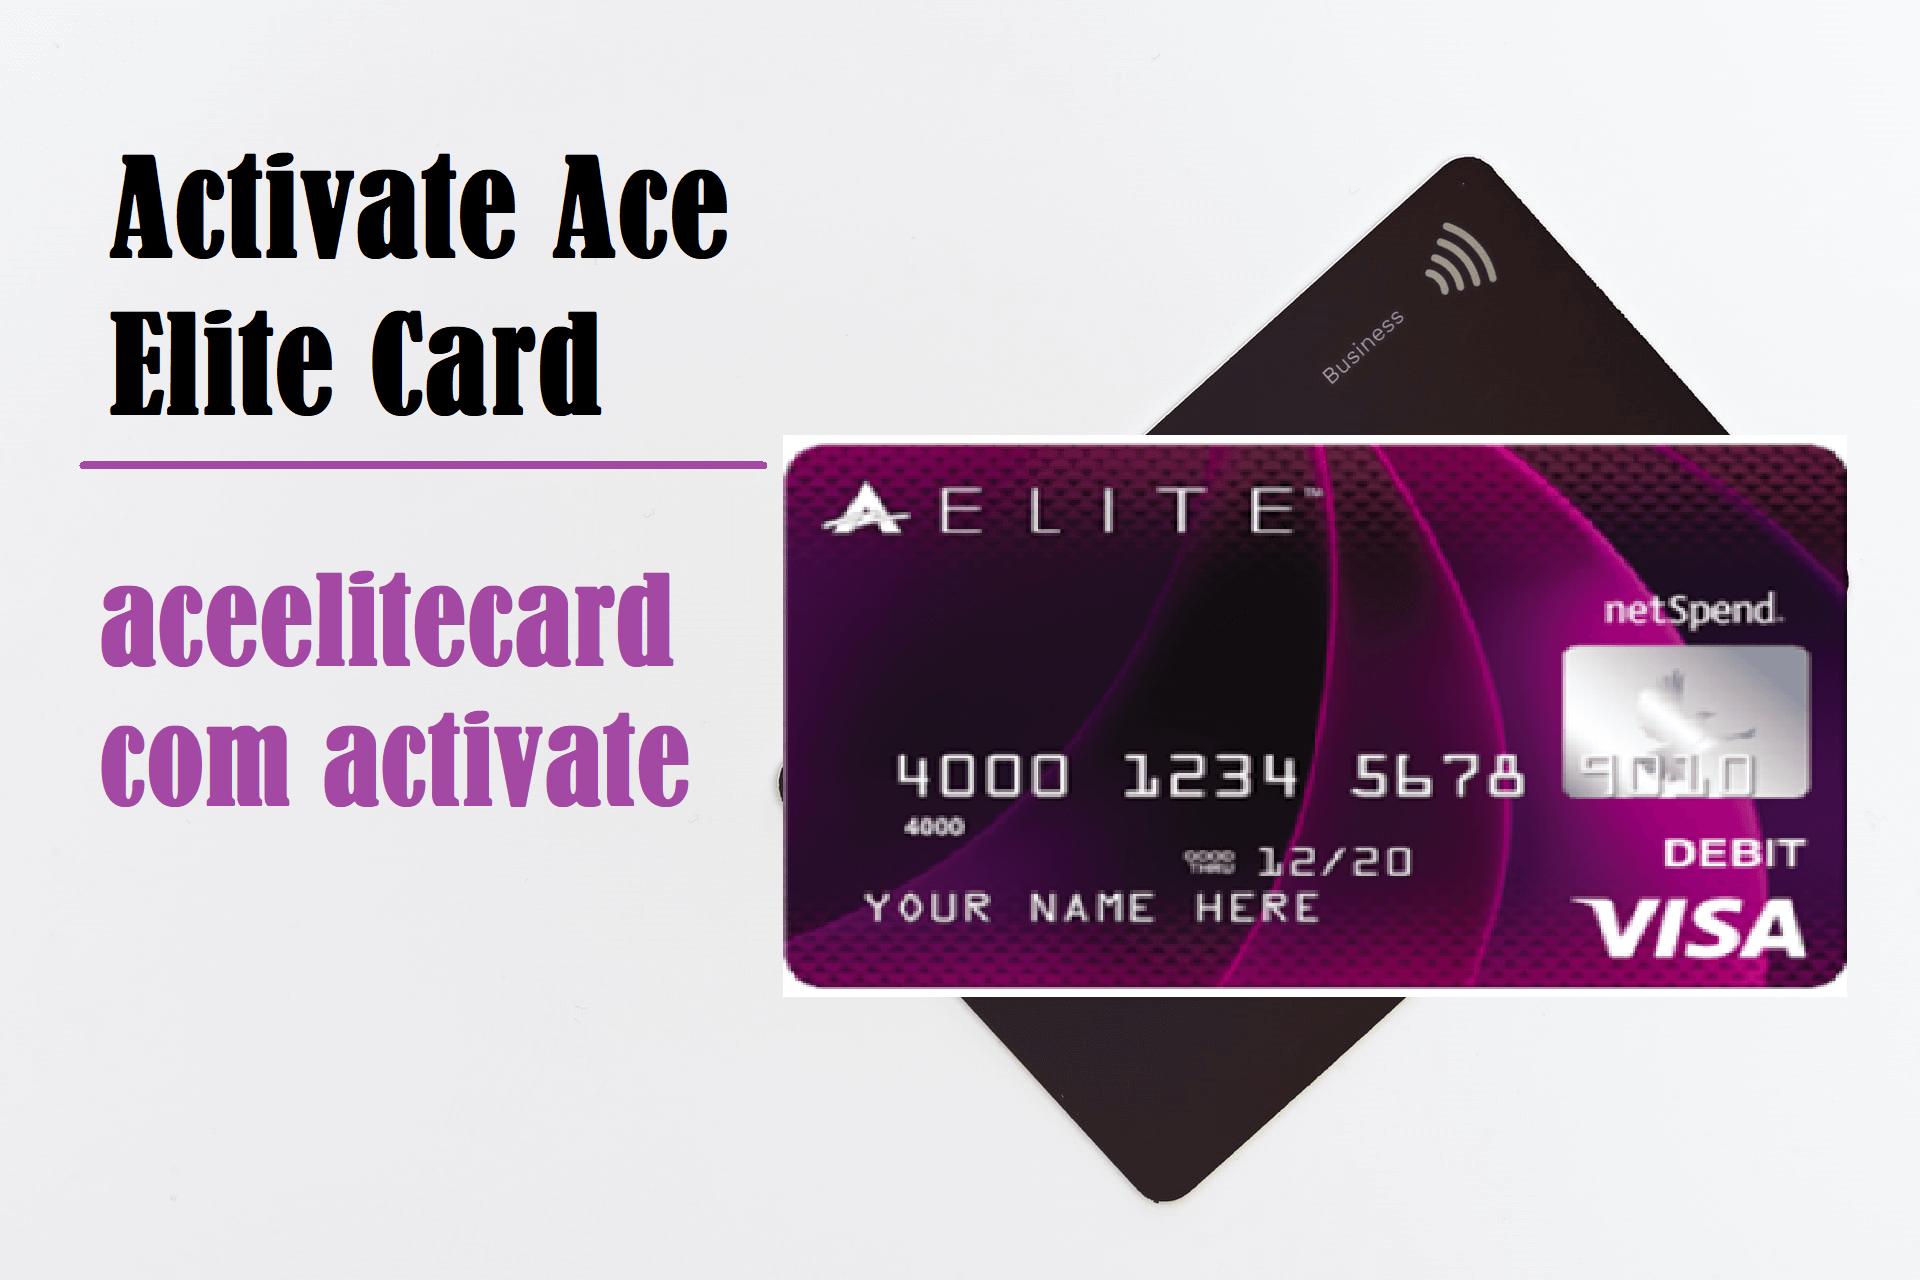 How to Activate Ace Elite Card aceelitecard com activate